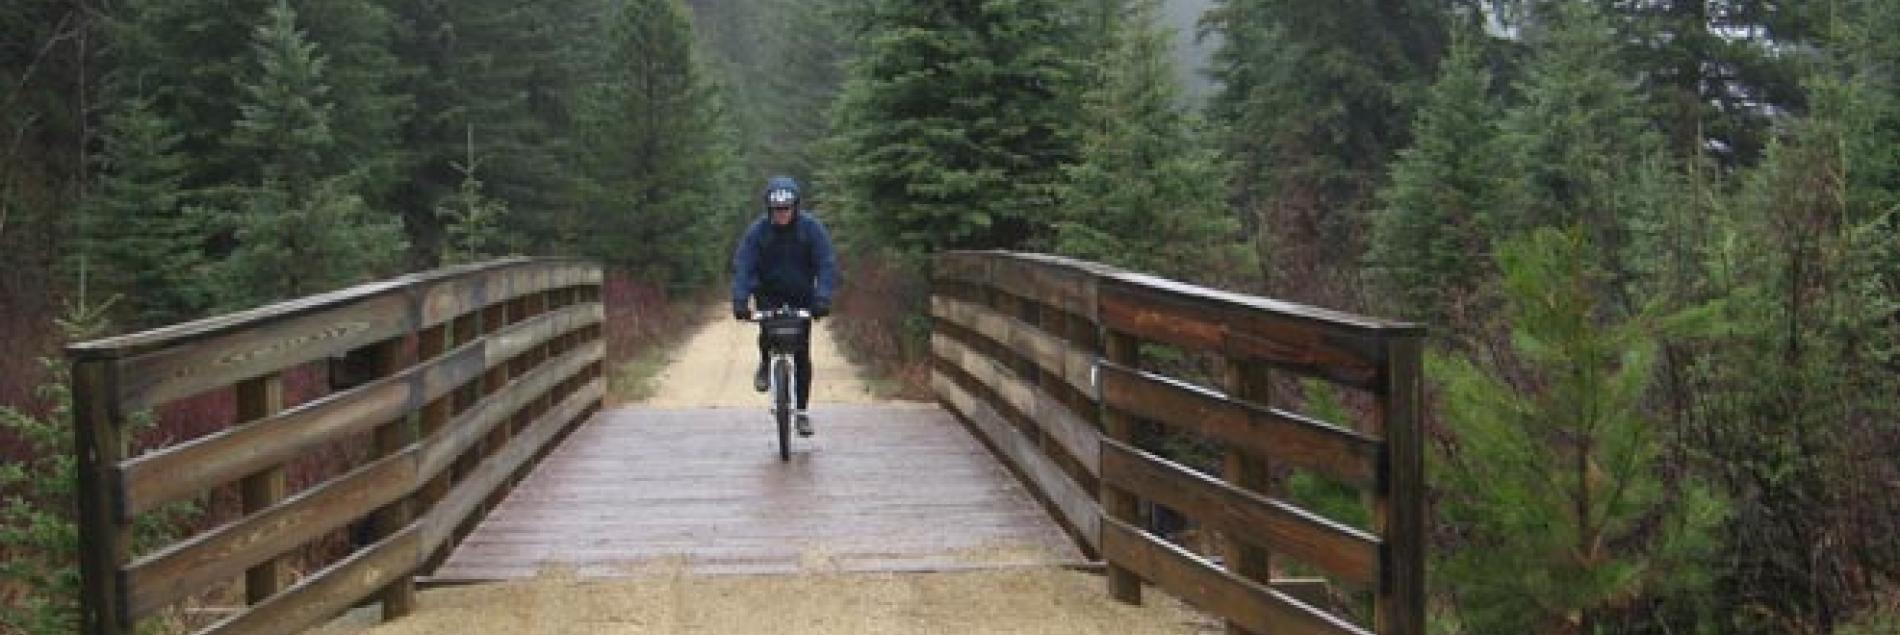 DeadWheels Bicycle Rentals